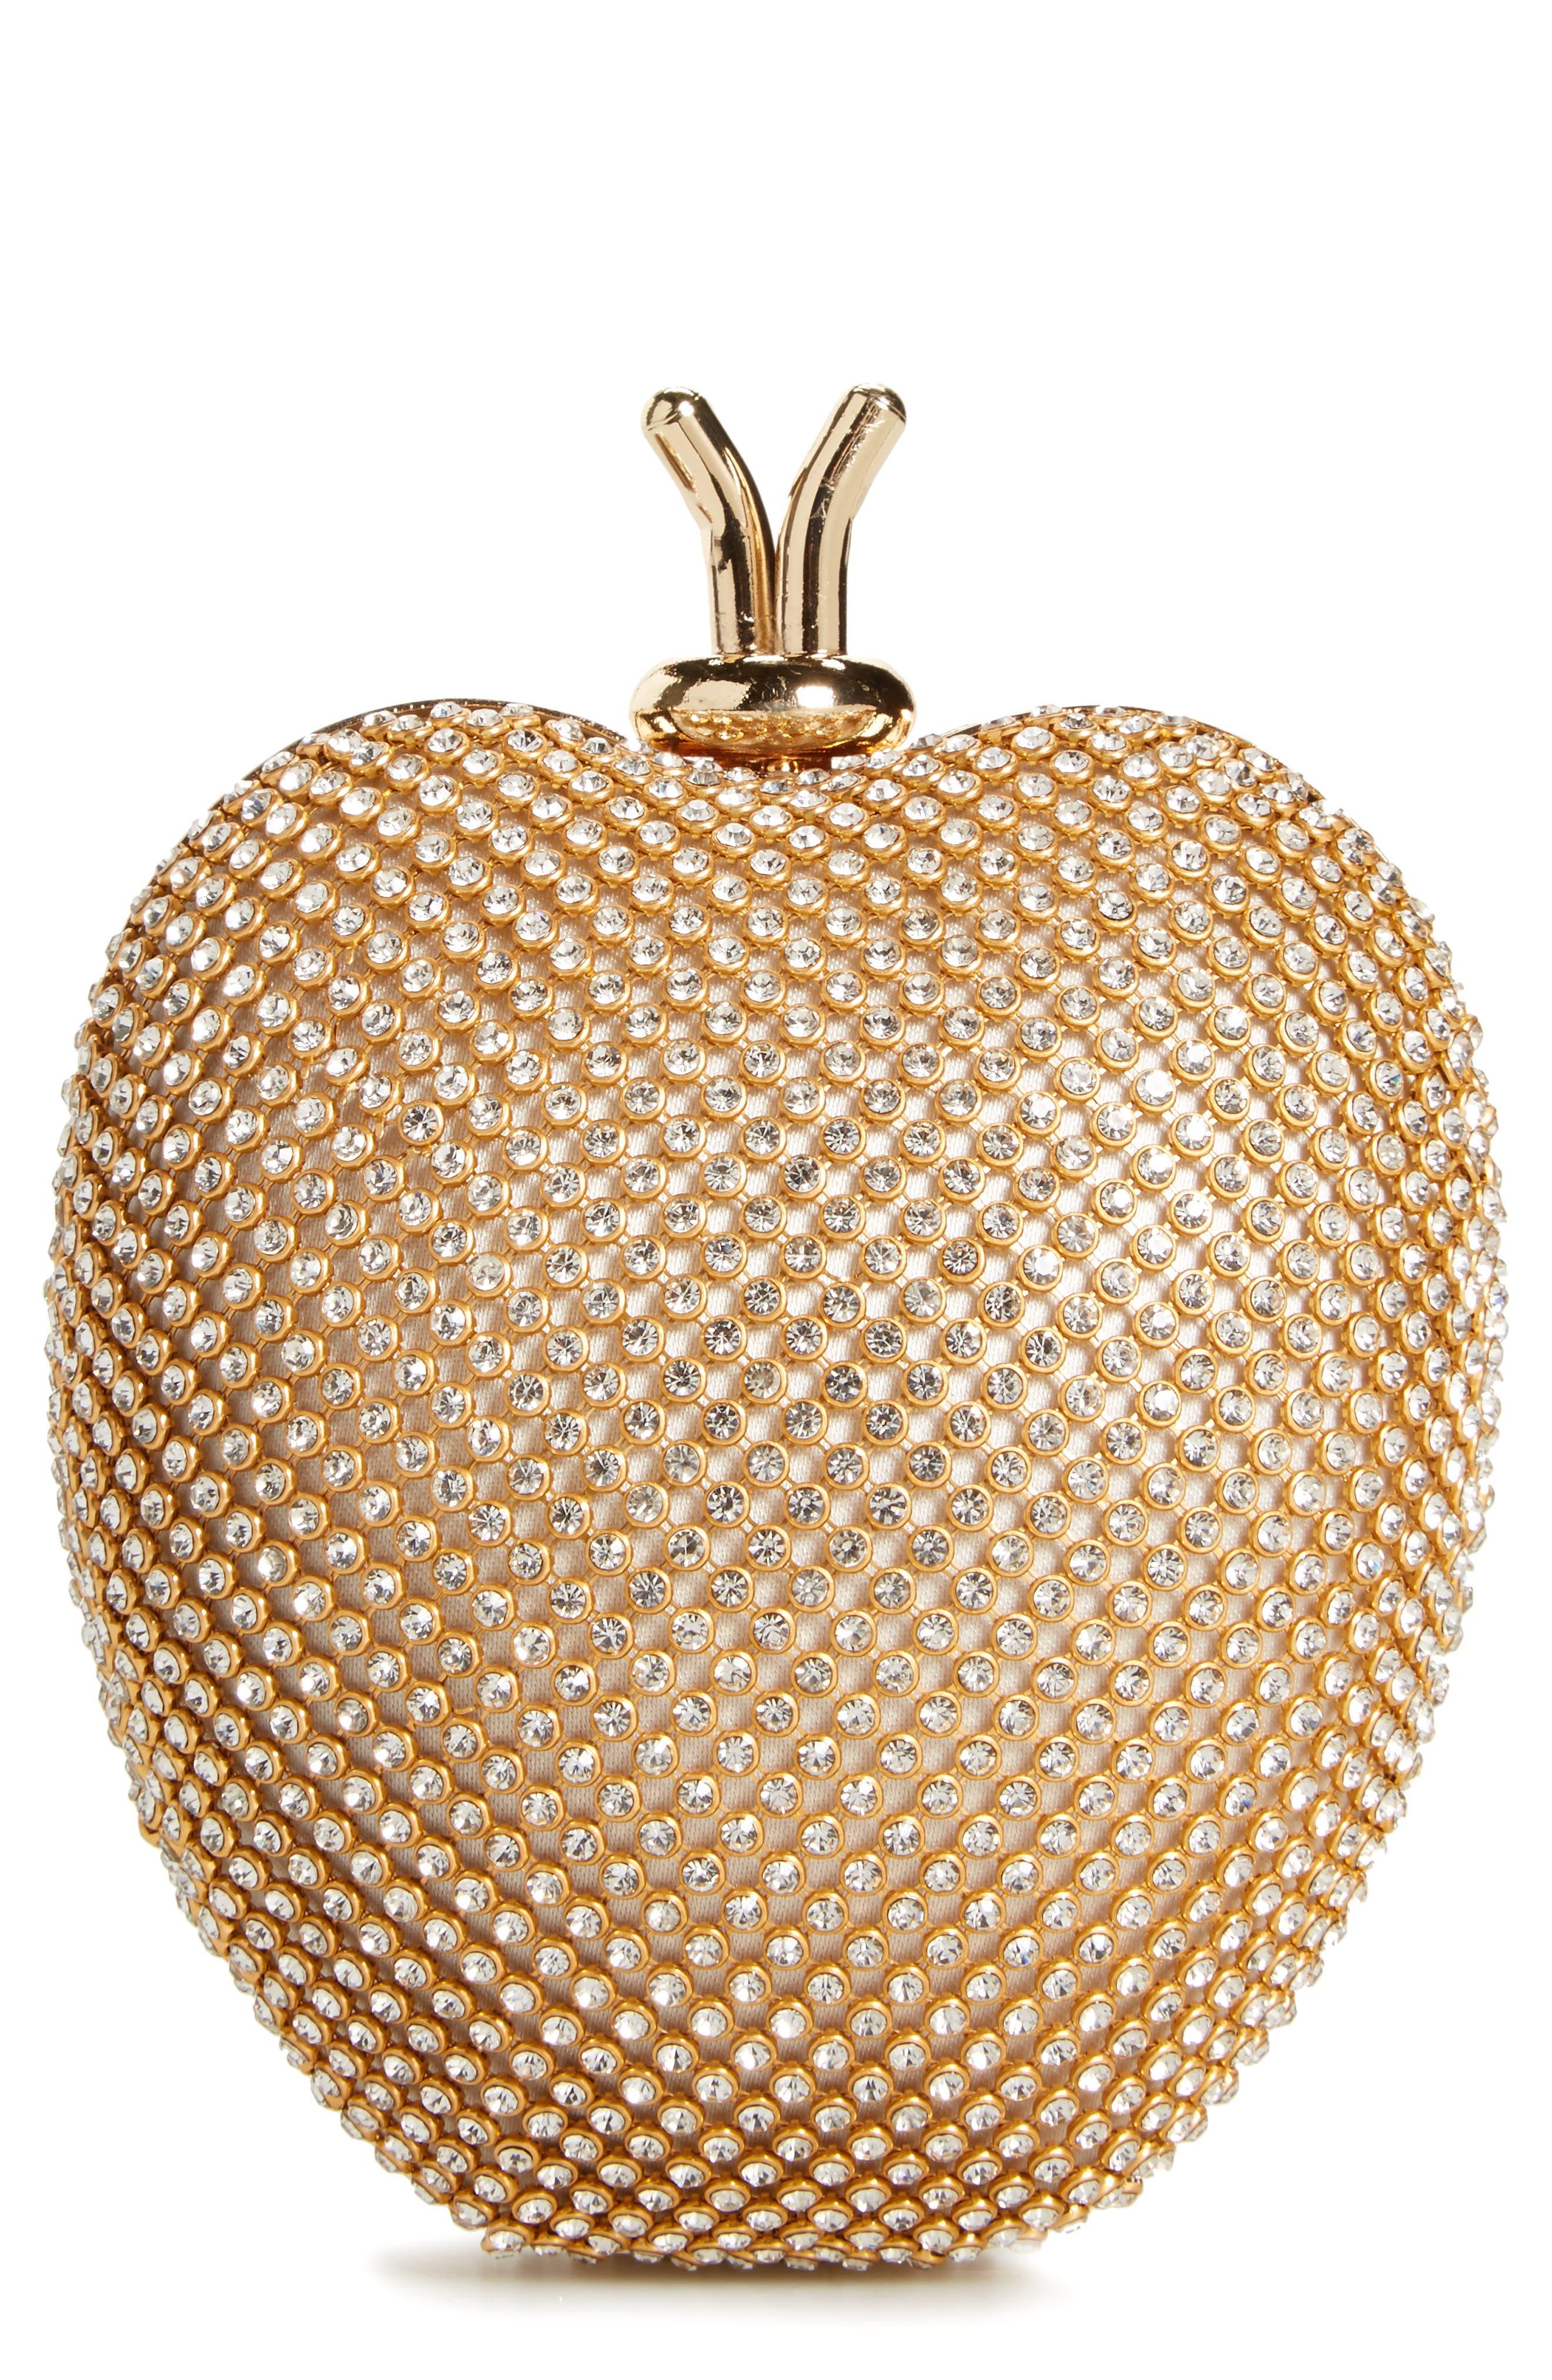 DAVID CHARLES Crystal Apple Bag